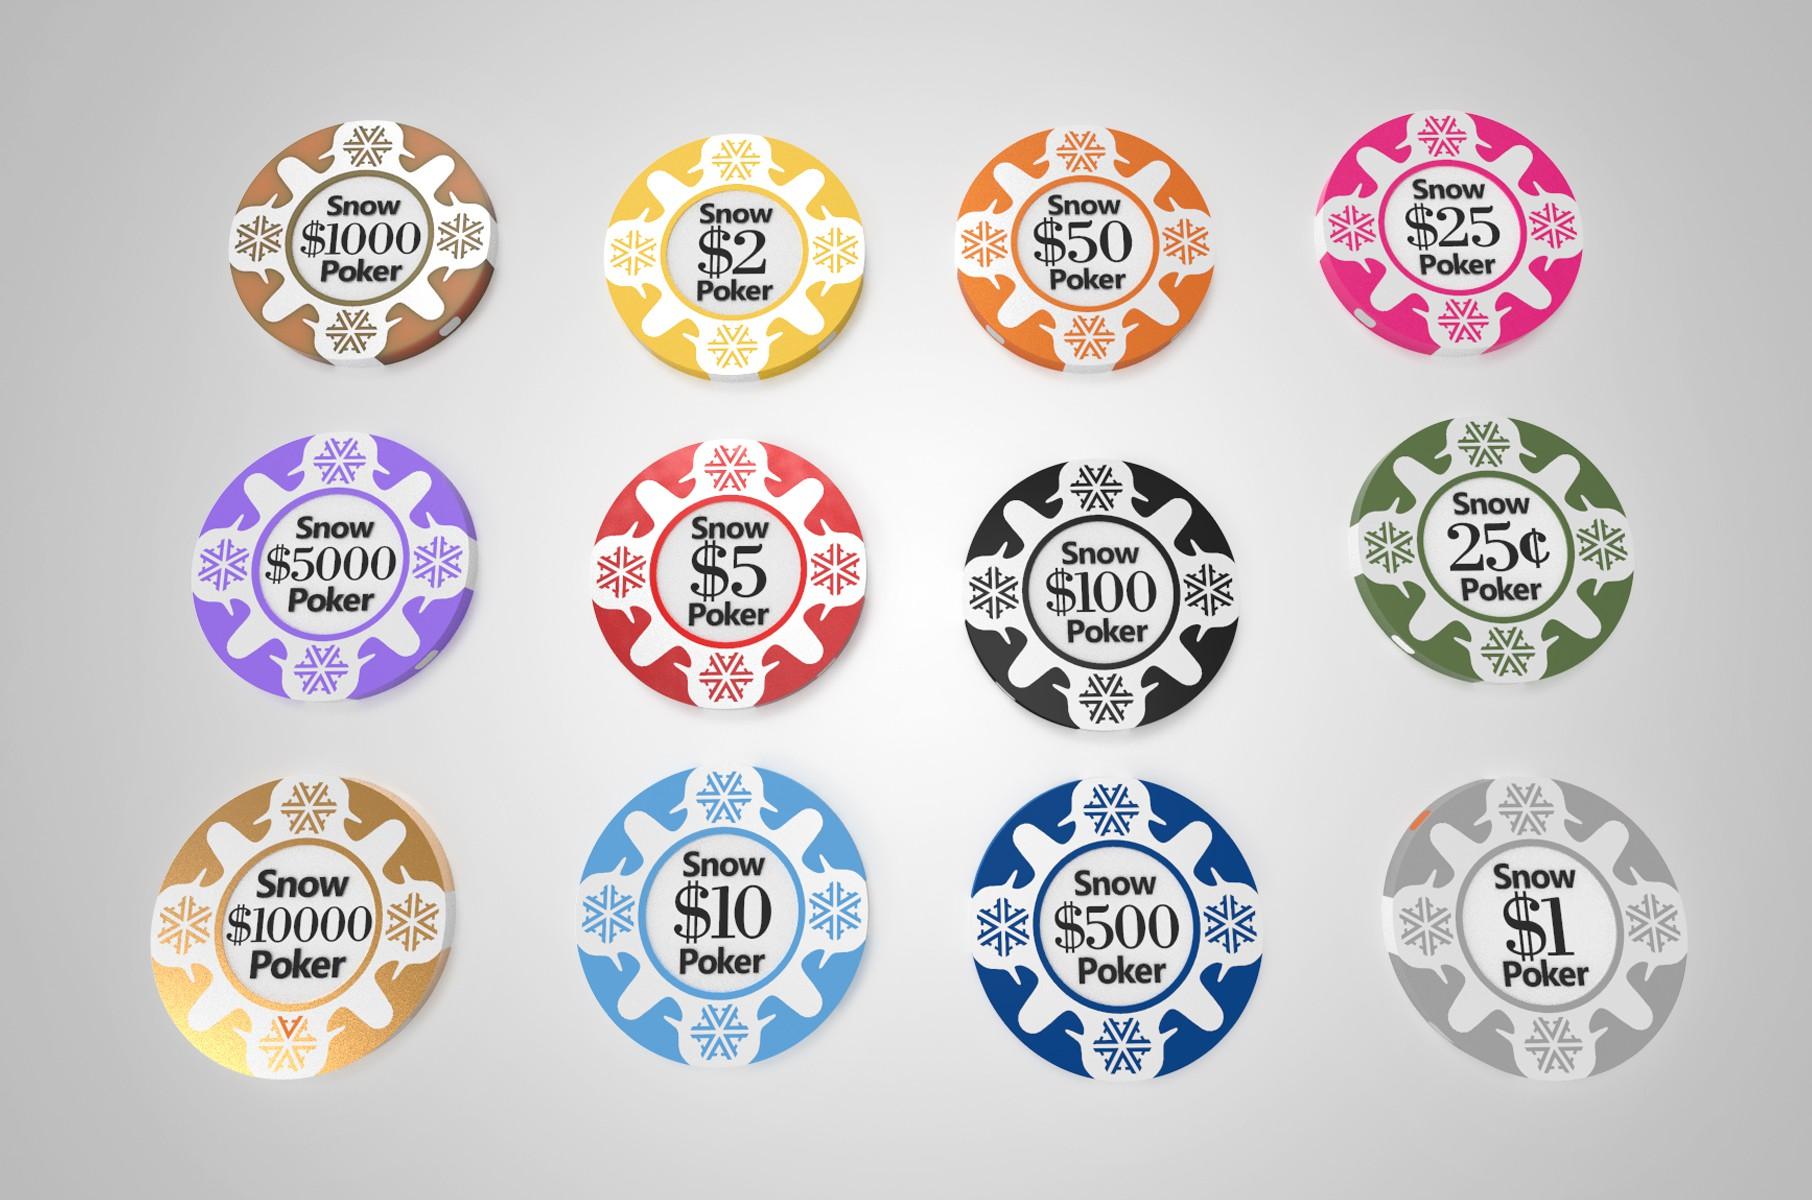 Create poker chip designs